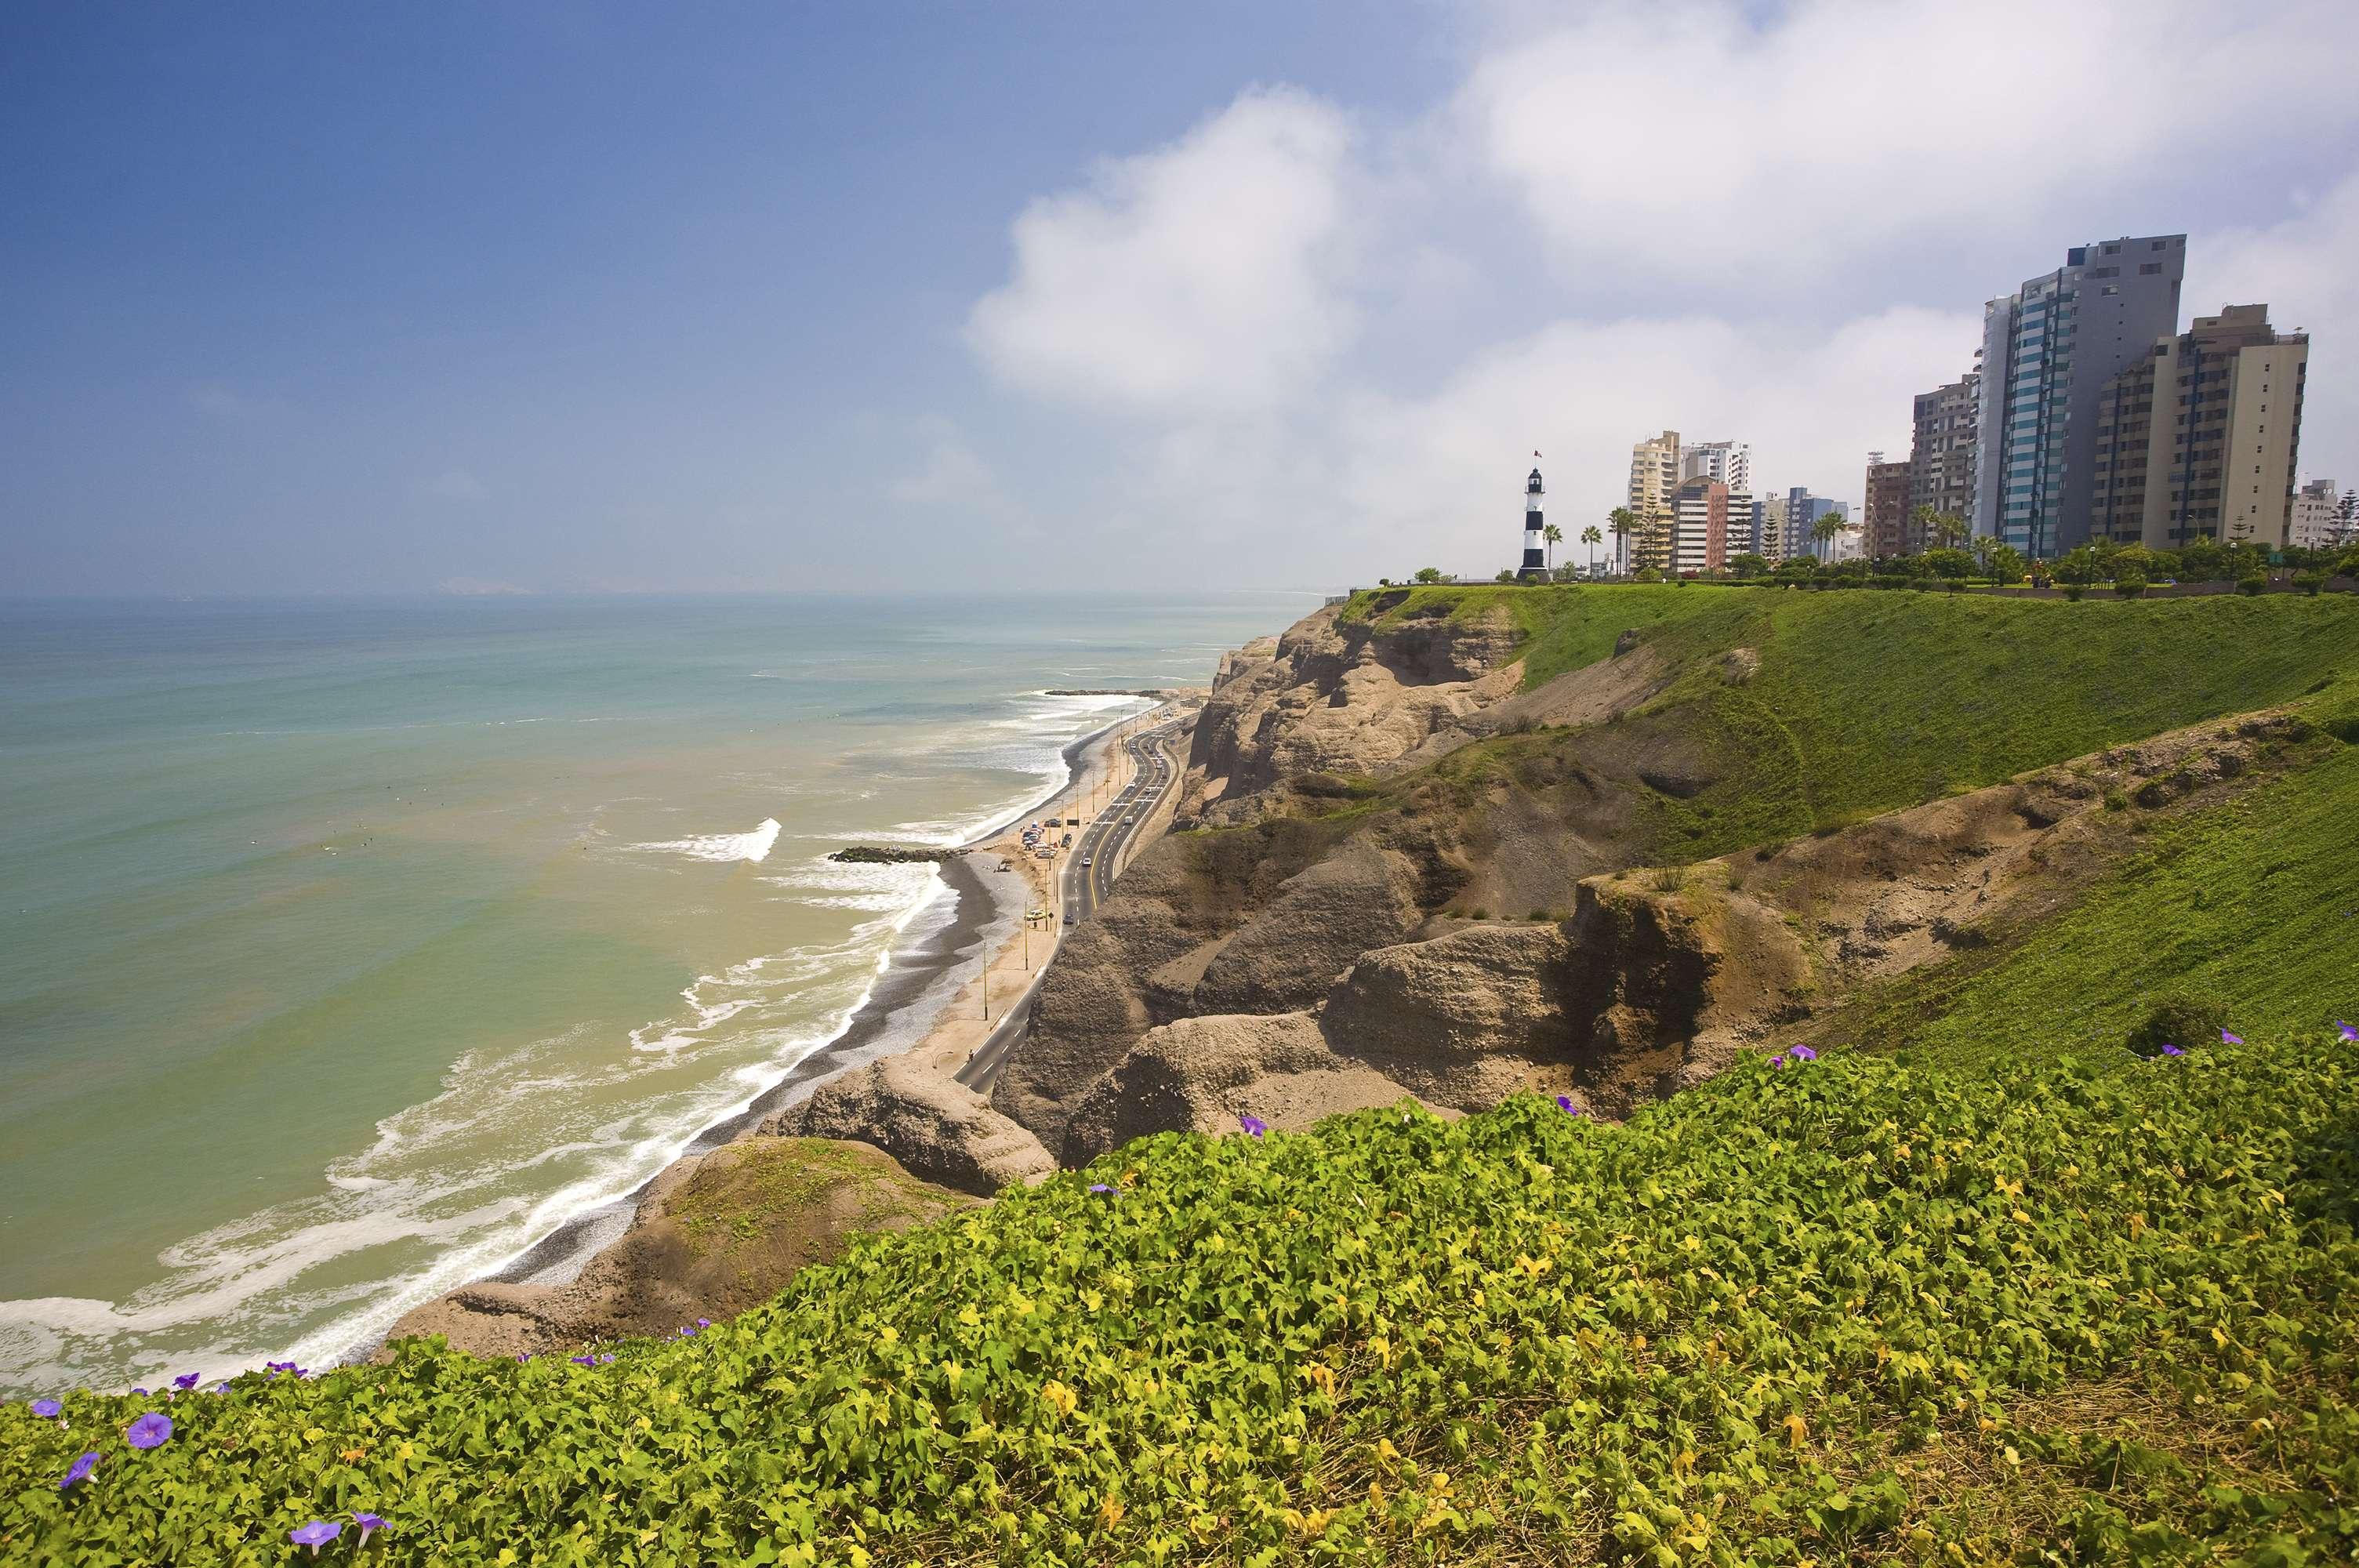 Inaugurarán Oficina de Turismo en Comisaría de Miraflores